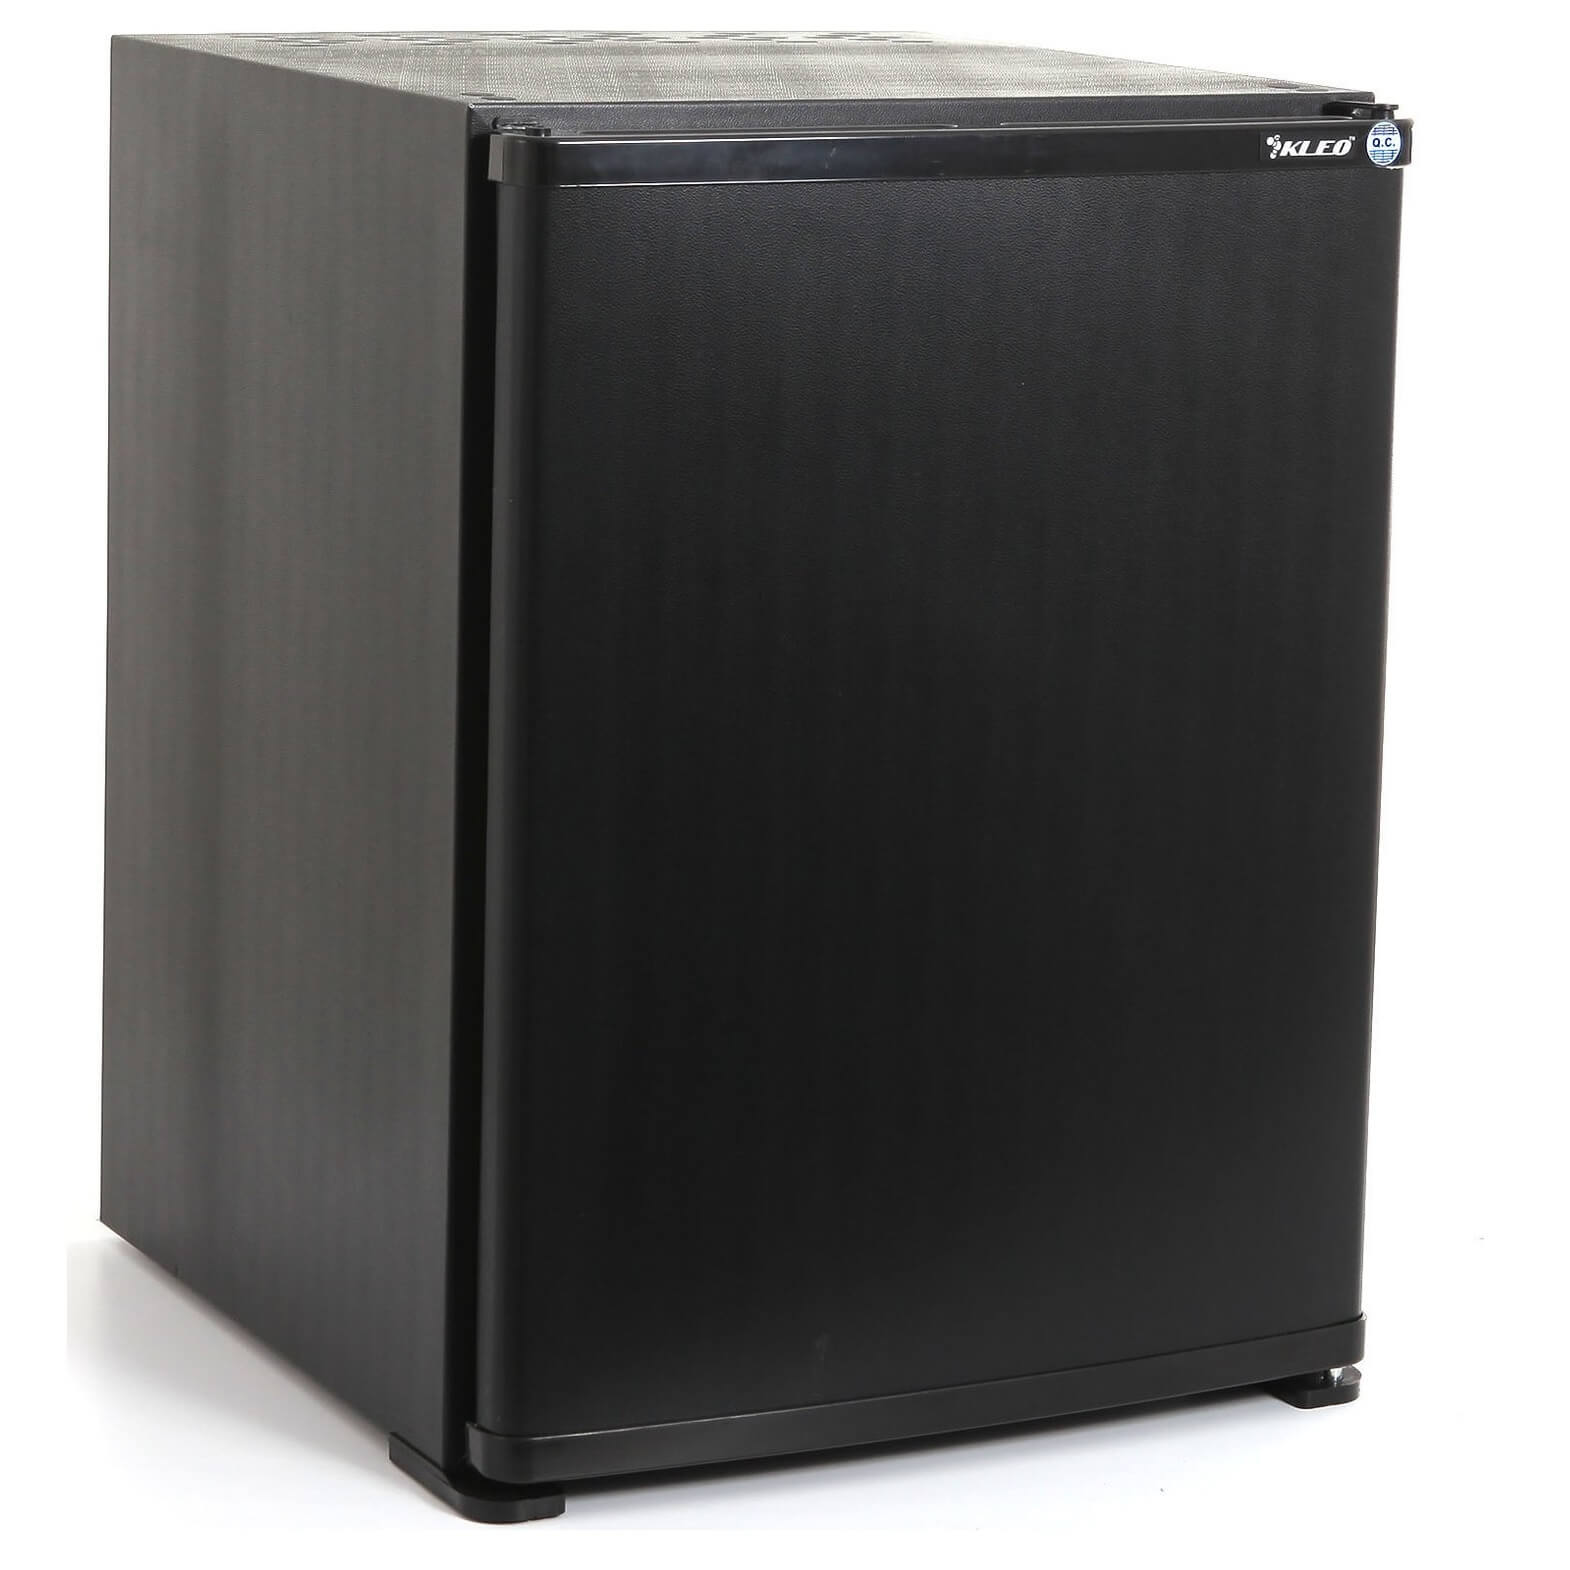 Kleo KMB35 C buzdolabi